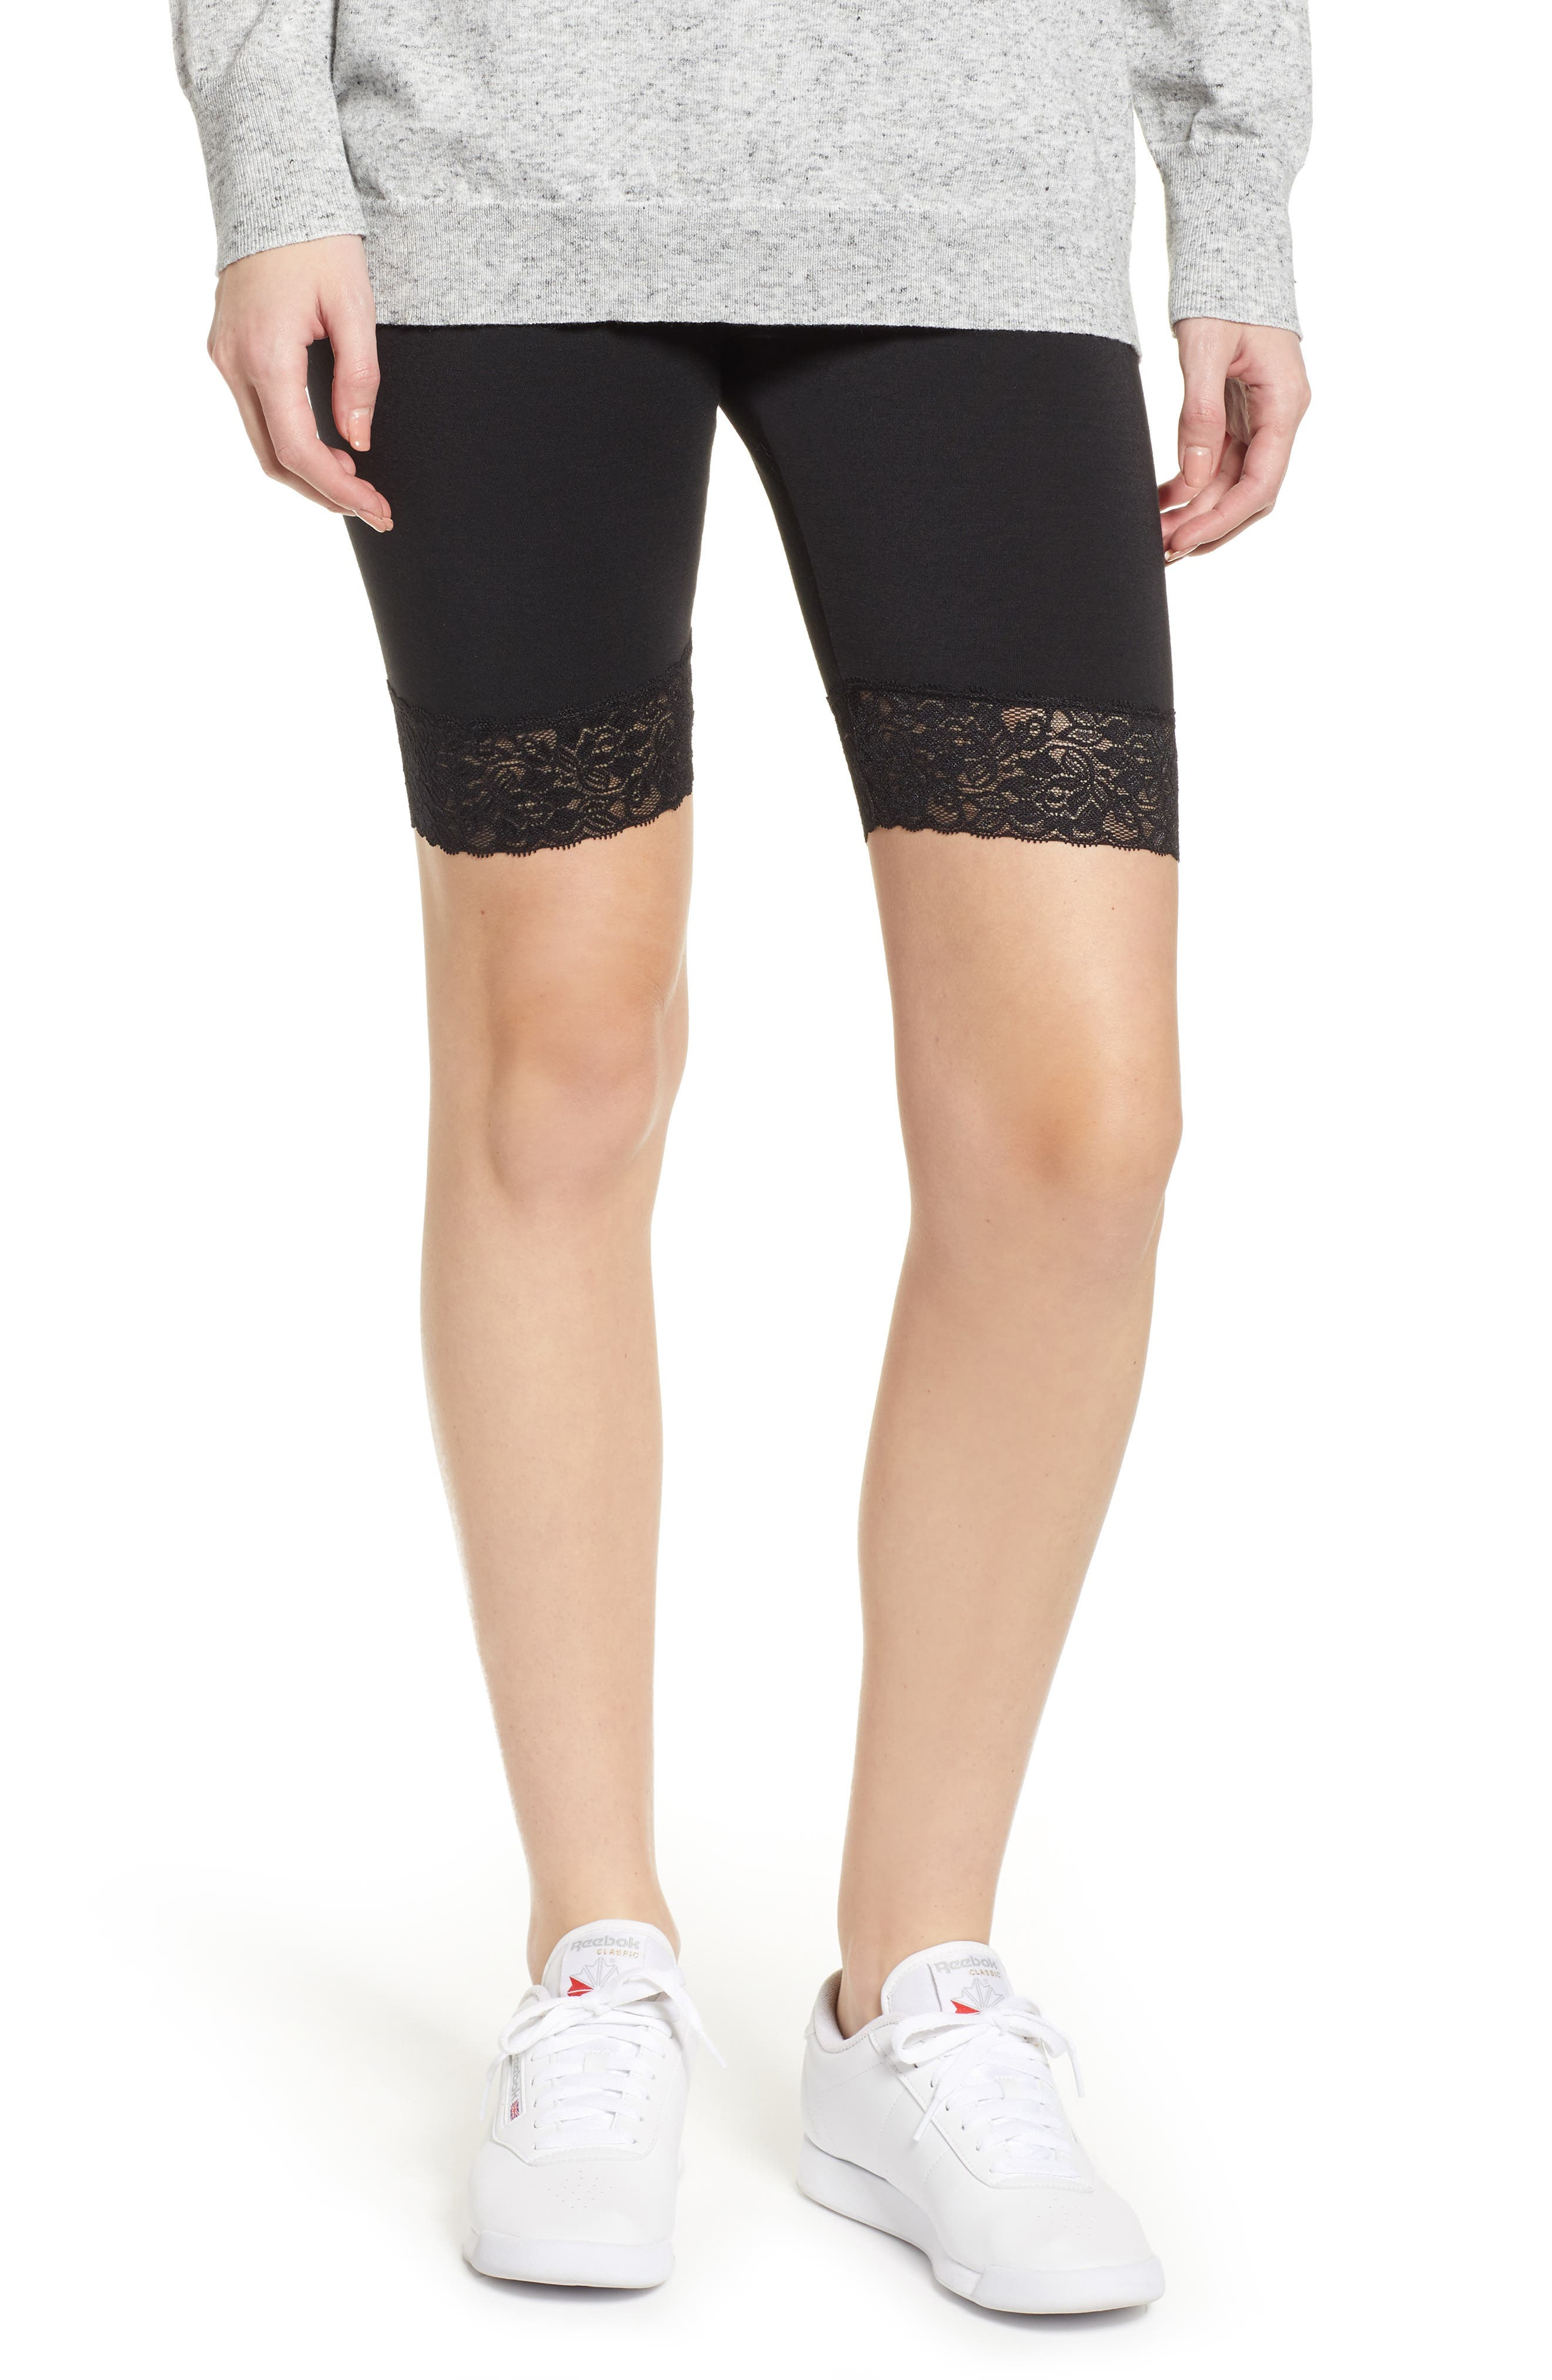 Make + Model Lace Trim Biker Shorts